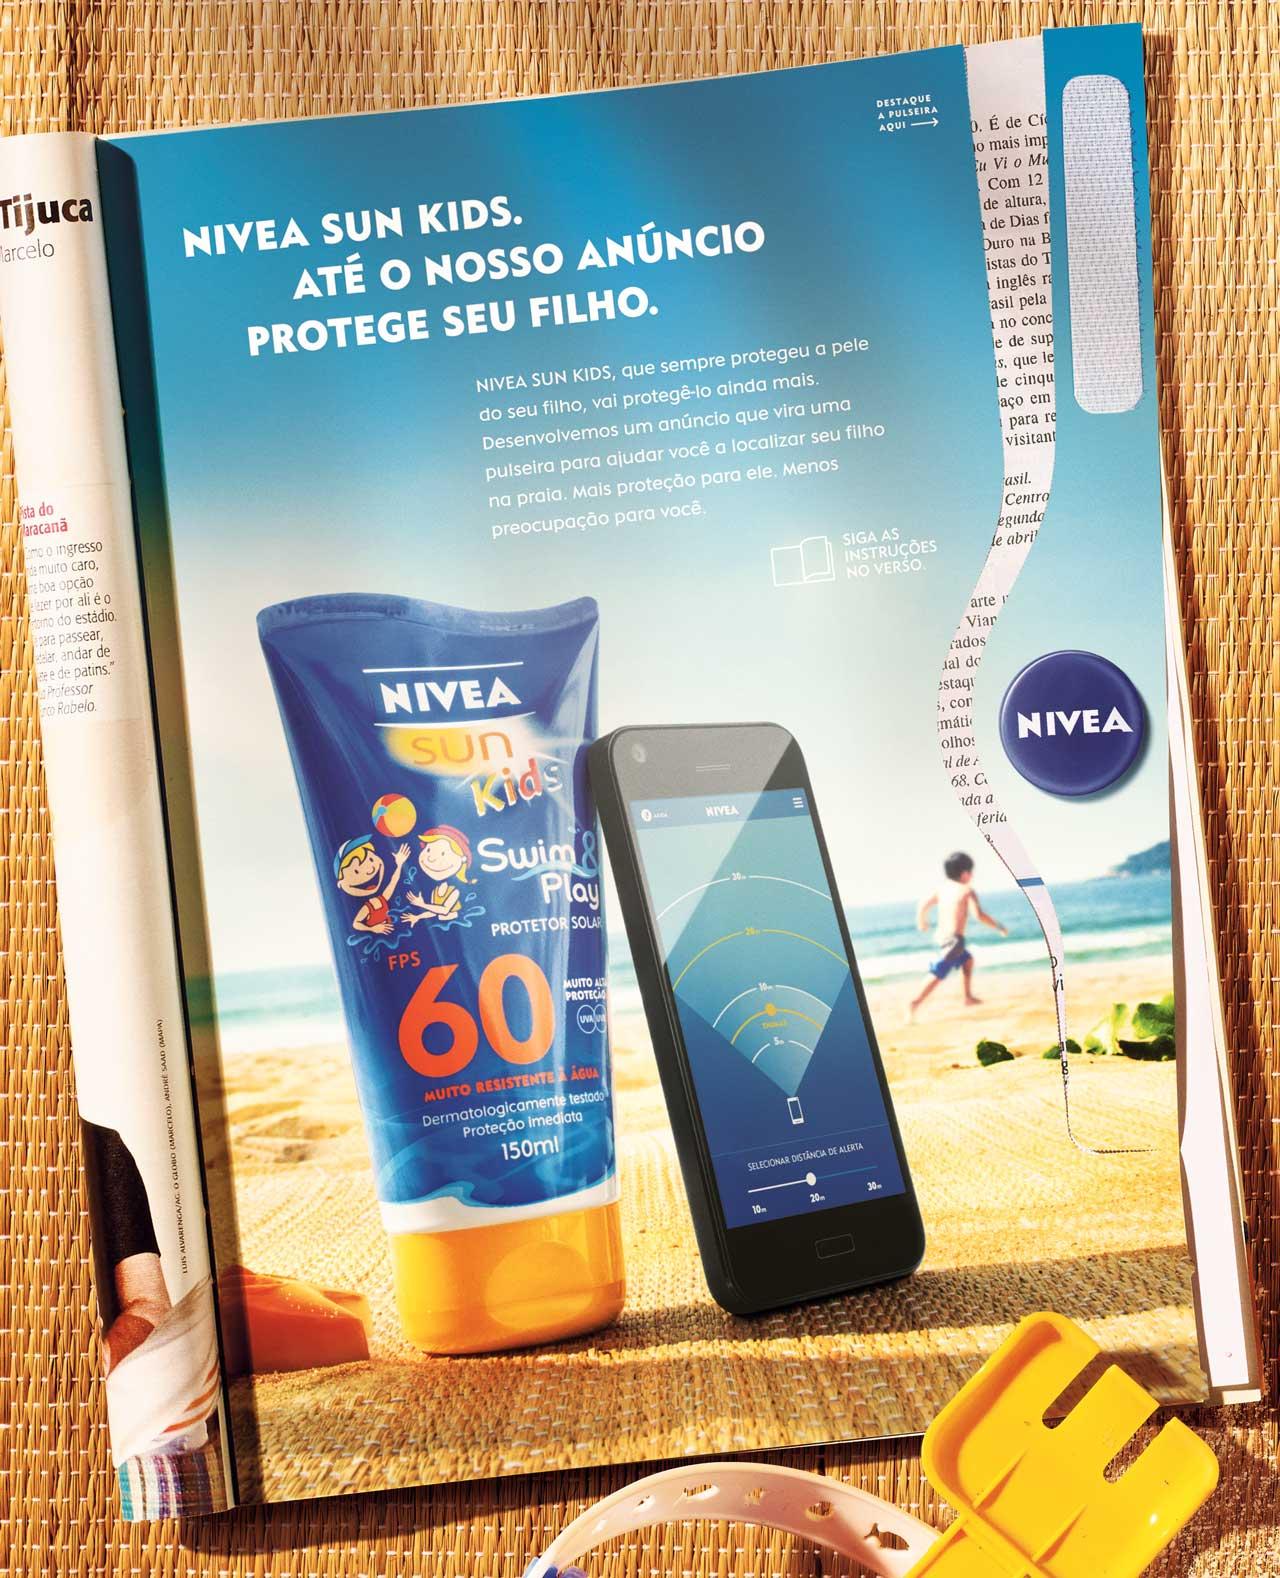 print_ad_portuguese.jpg